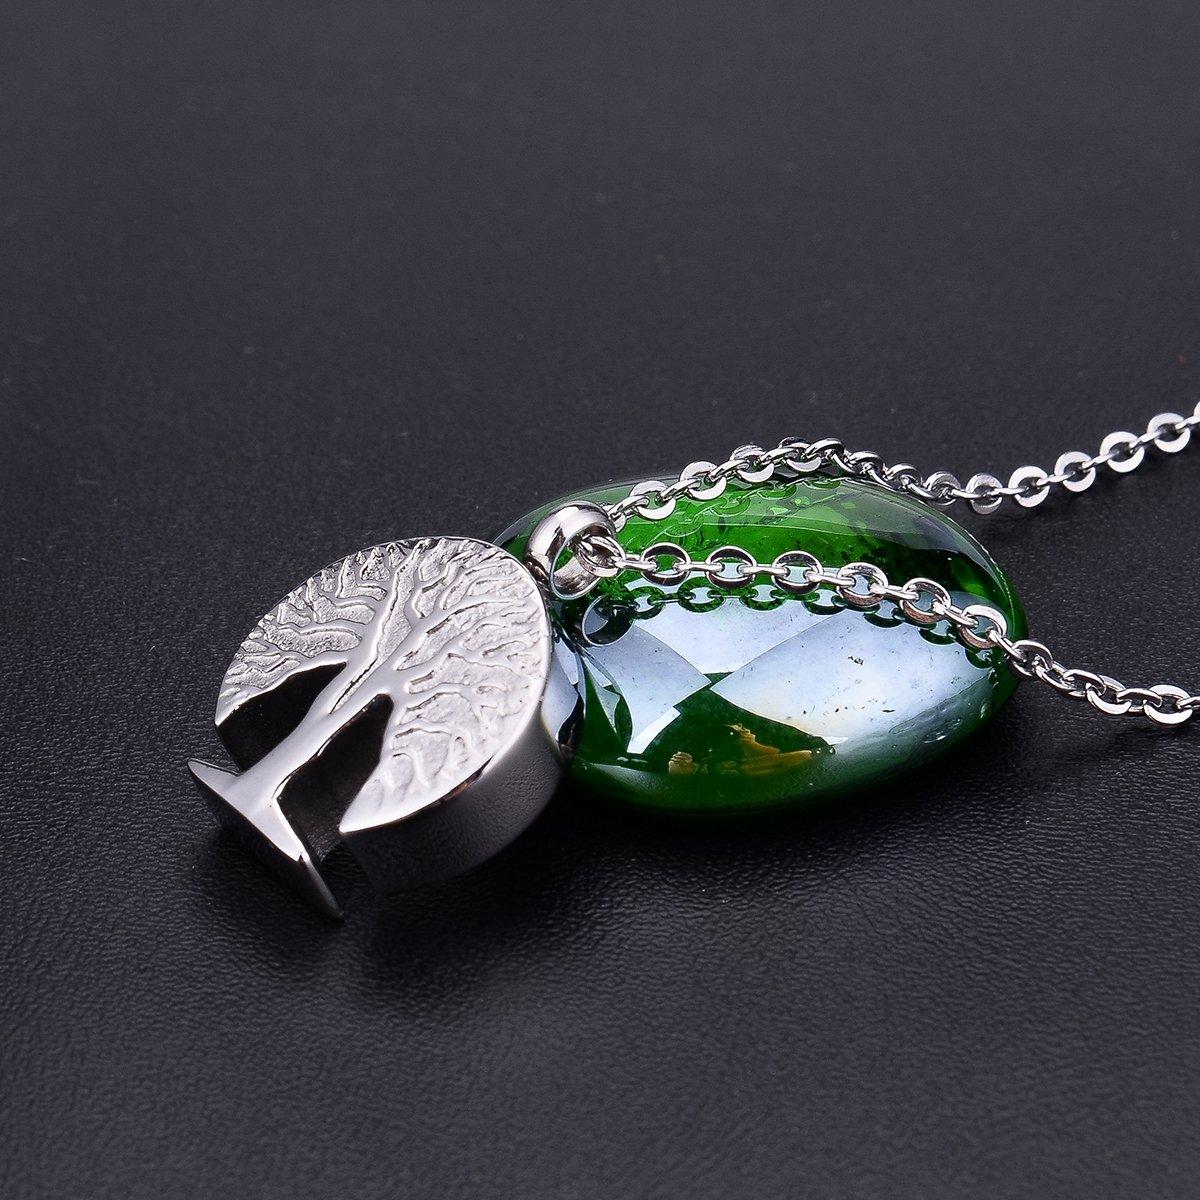 BS Bluesnow Tree of Life Urn Keepsake Pendant Necklace Memorial Ash Cremation Jewelry